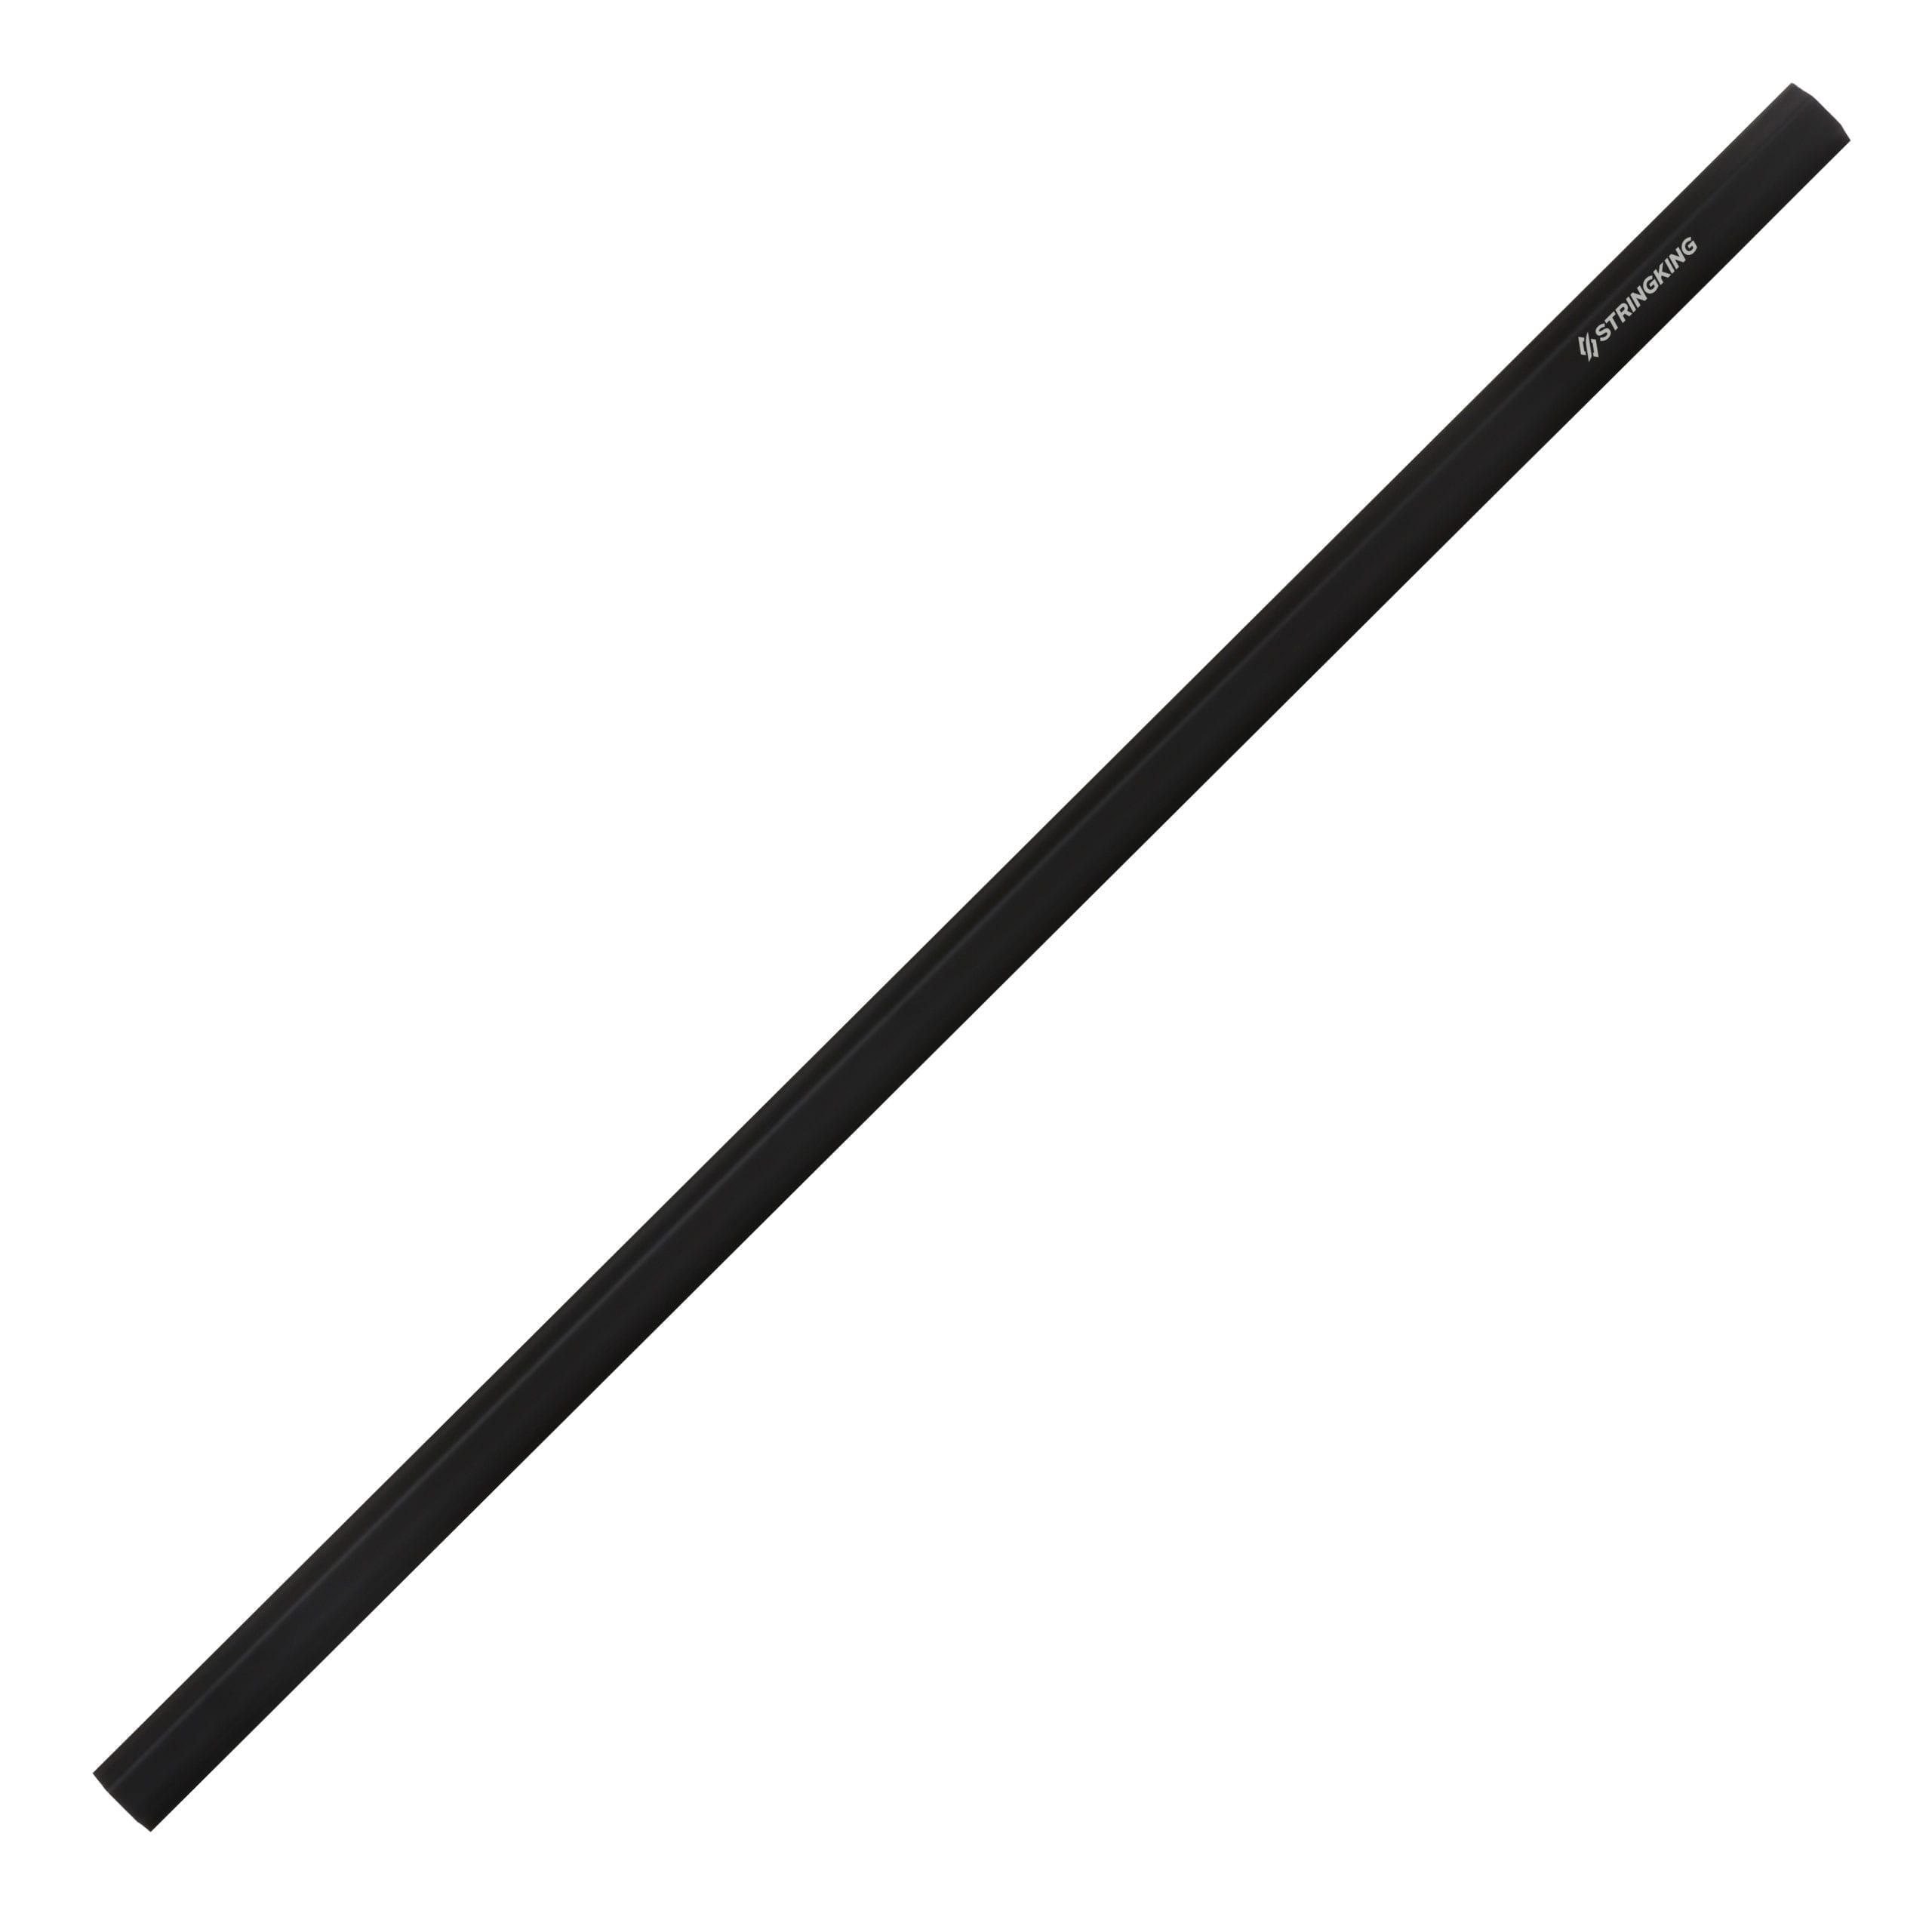 A-Series-Full-Lacrosse-Shaft-Black-scaled-1.jpg